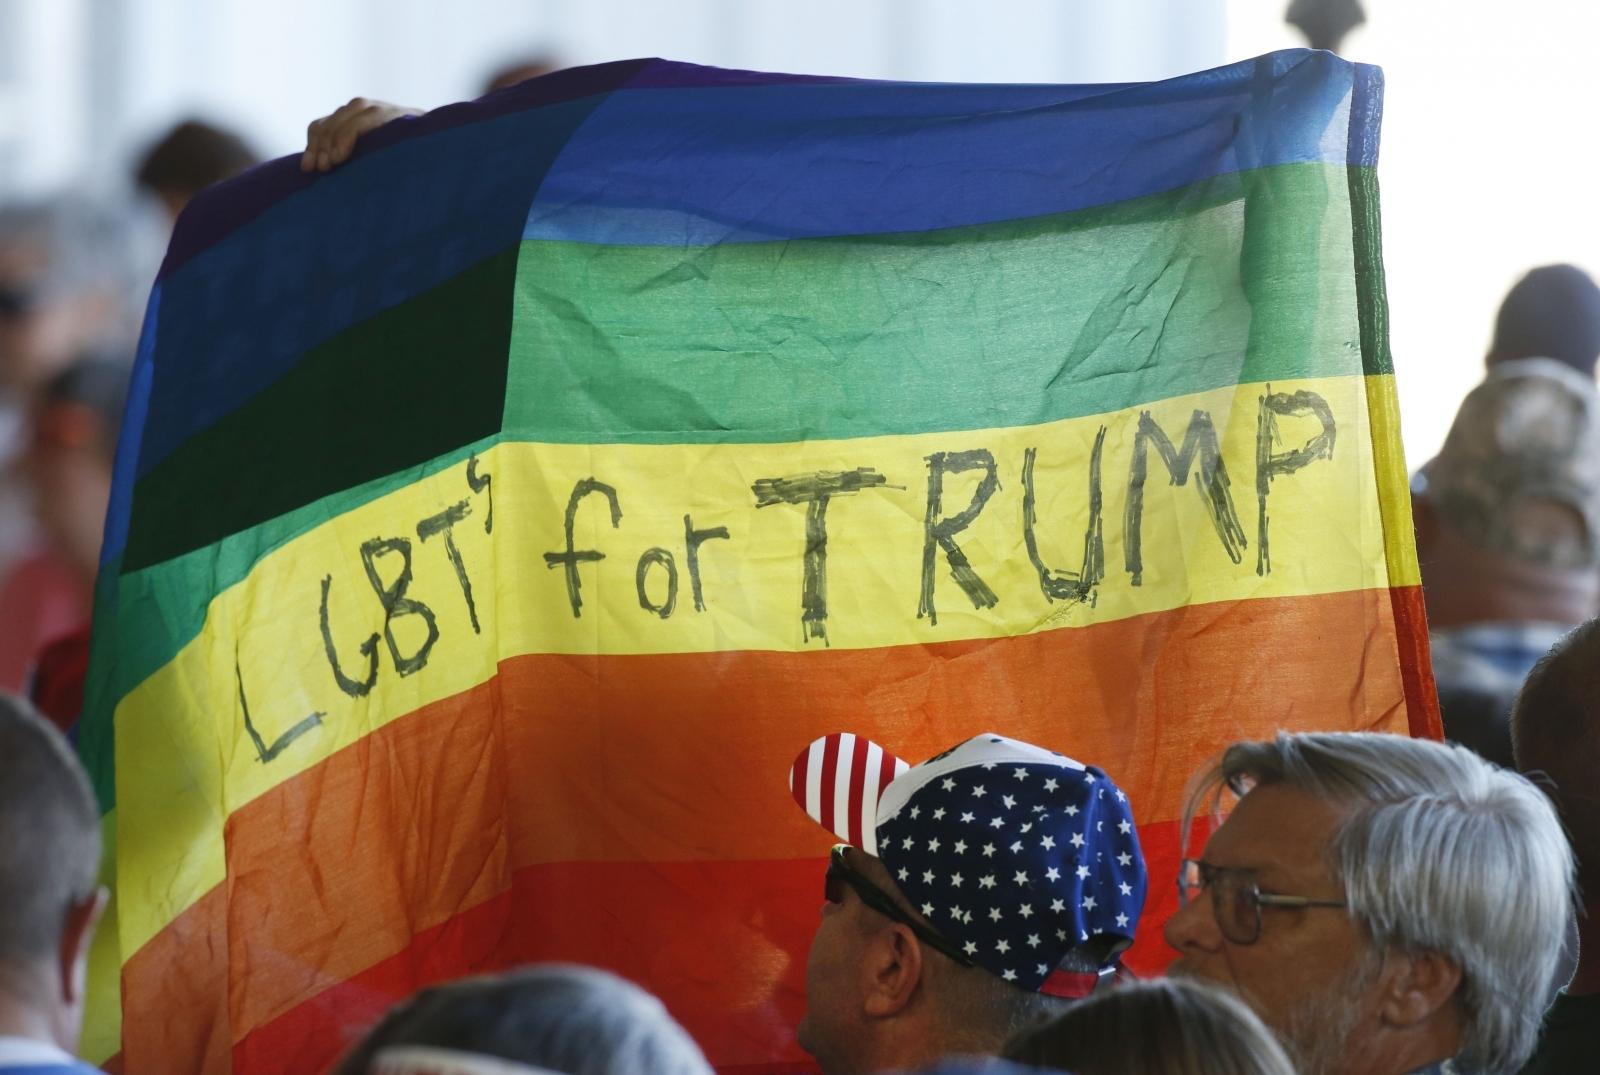 LGBT For Trump flag